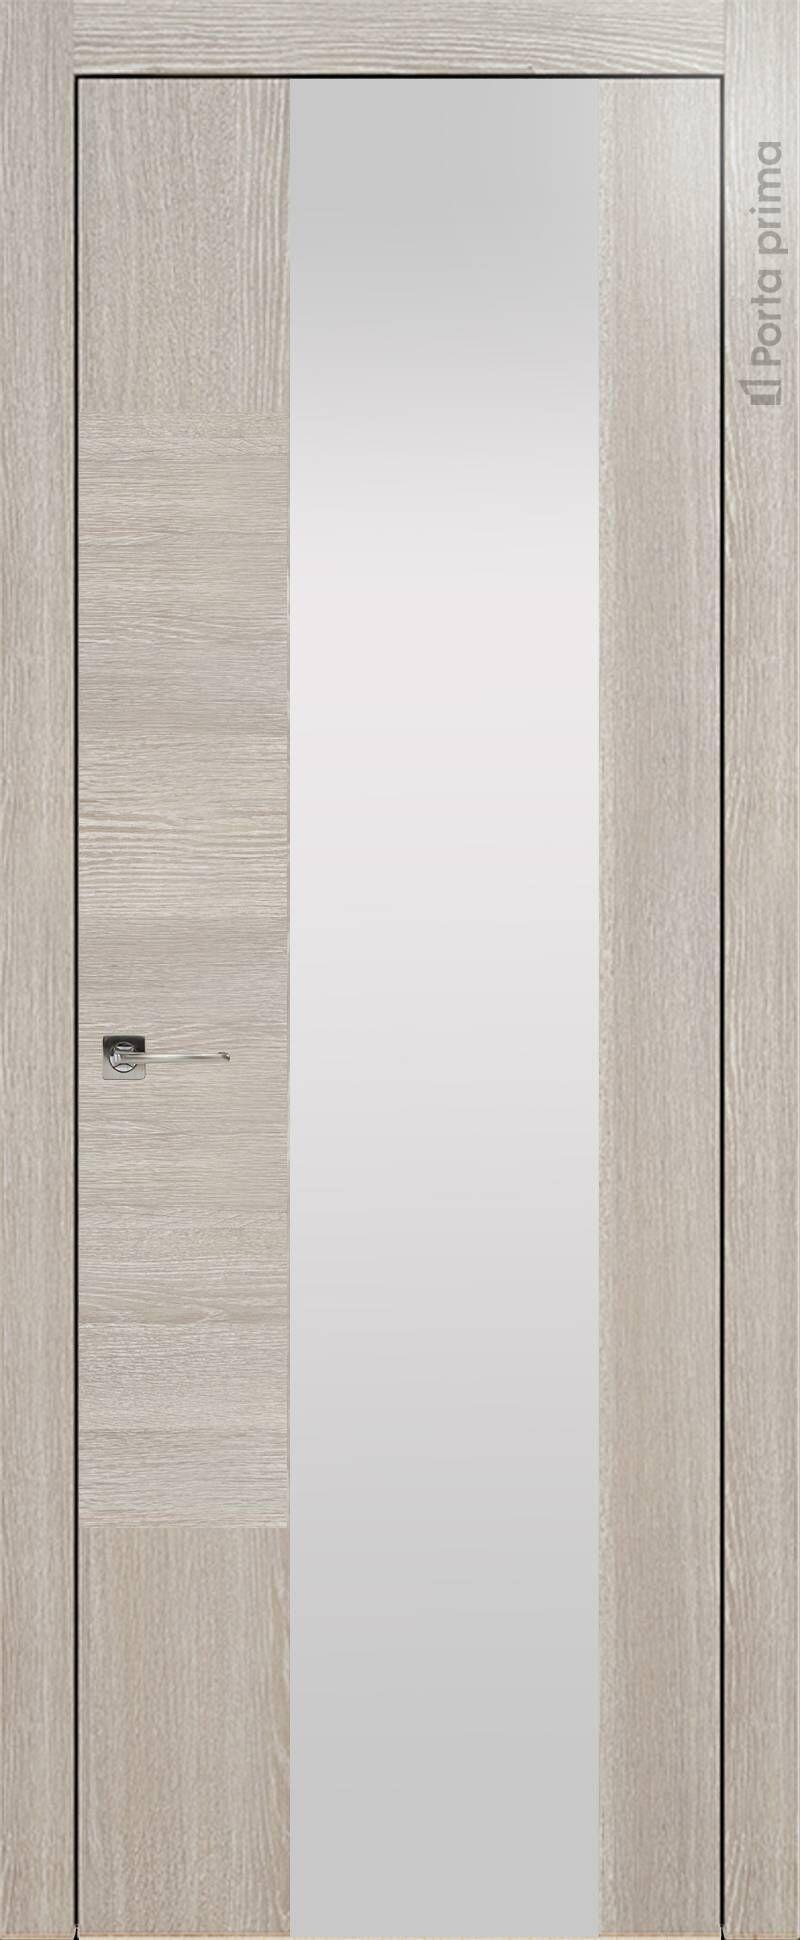 Tivoli Е-1 цвет - Серый дуб Со стеклом (ДО)